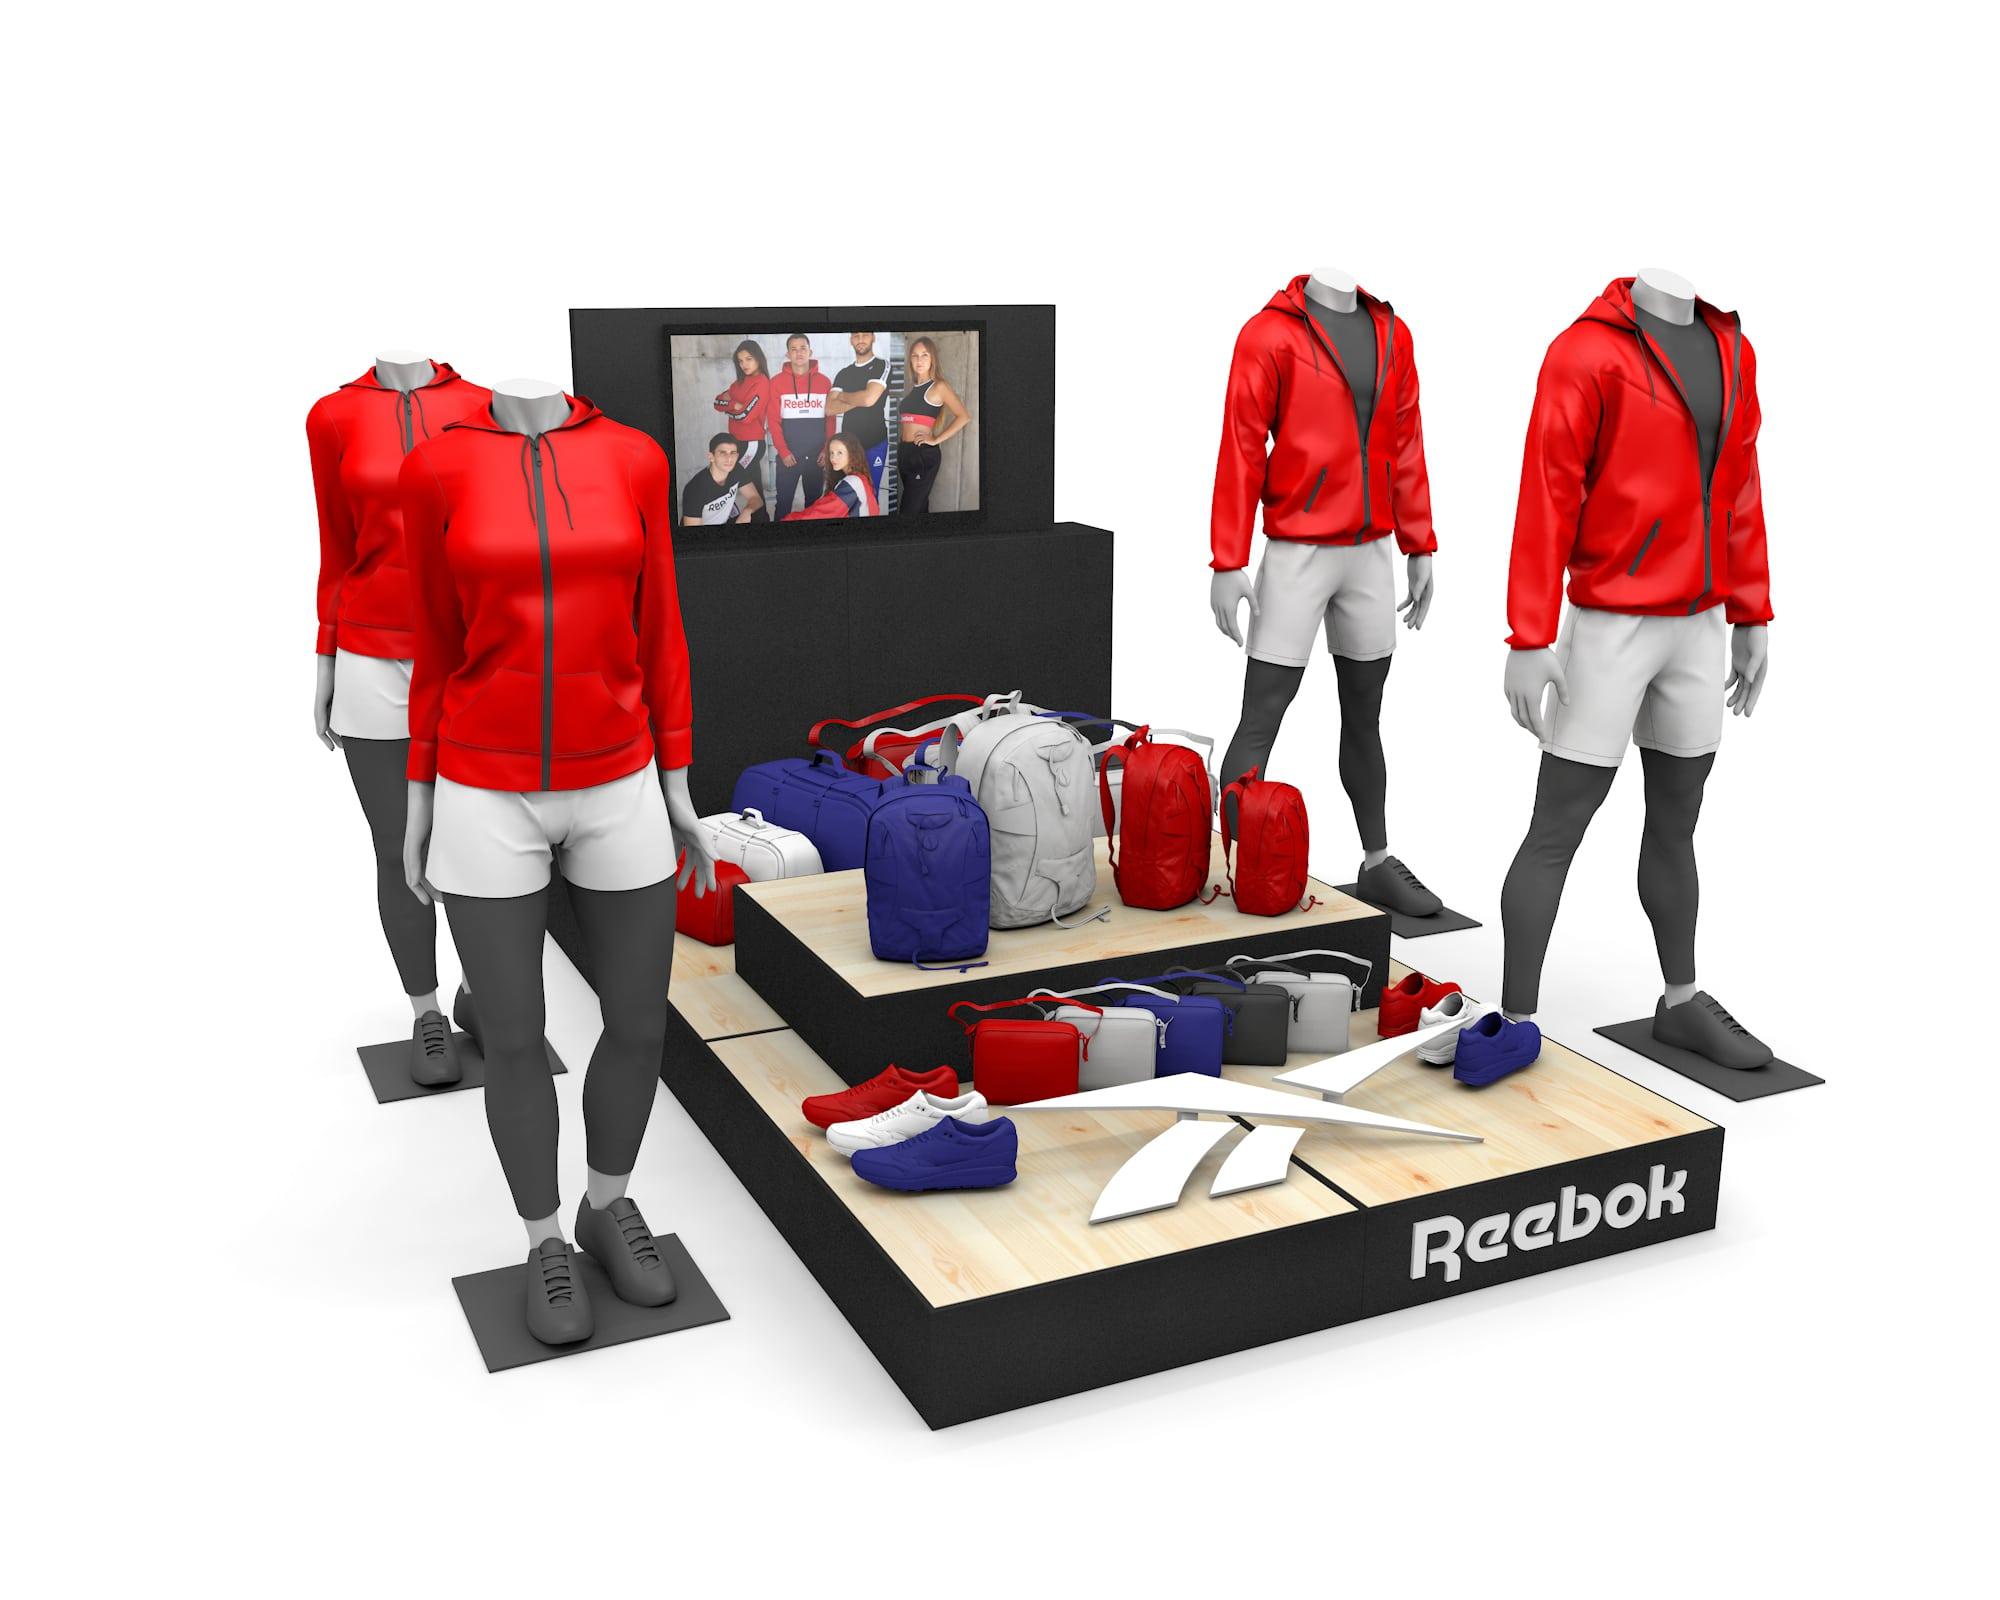 zone event reebok show room